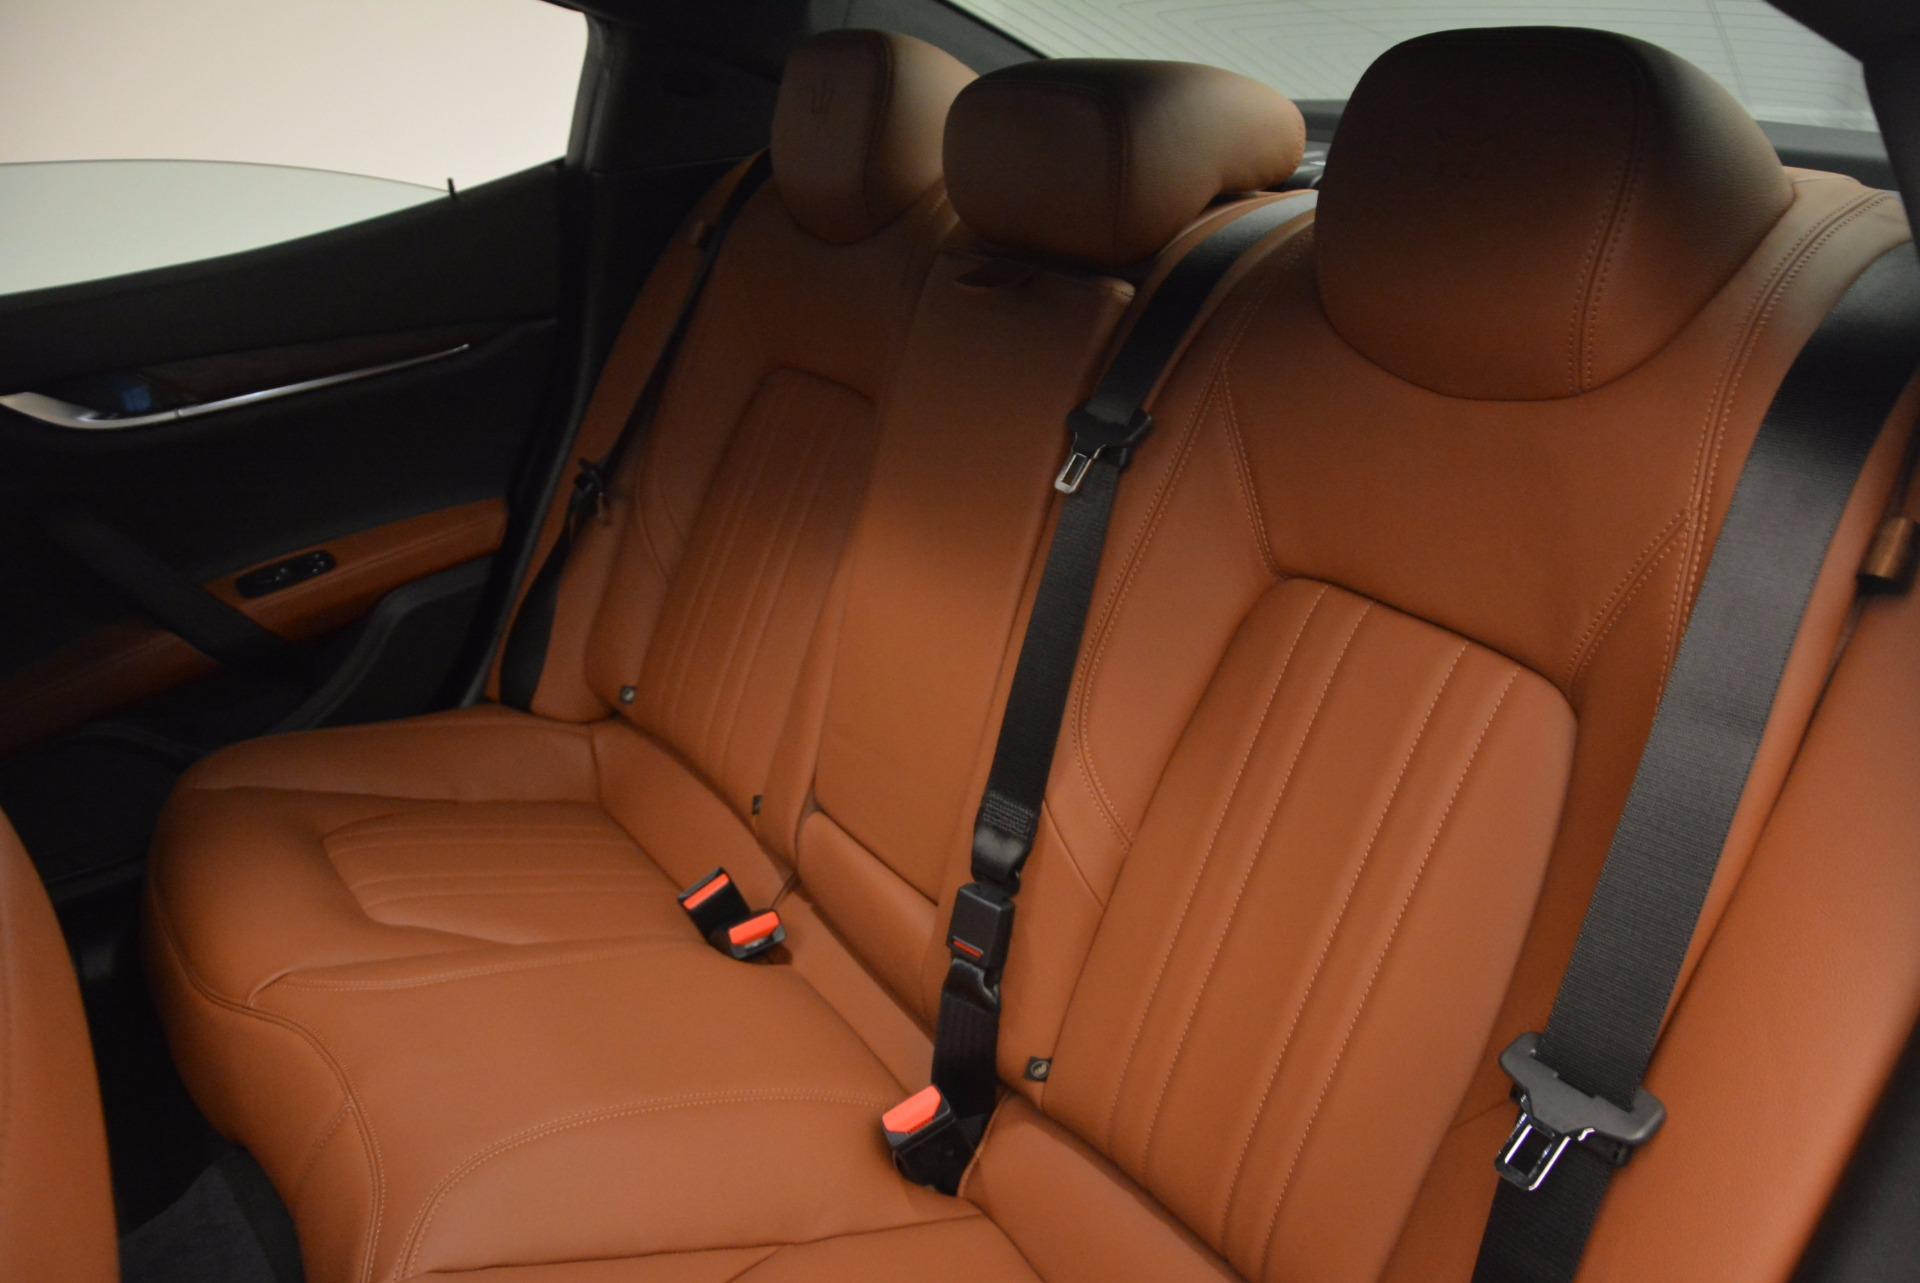 Used 2017 Maserati Ghibli S Q4 Ex-Loaner For Sale In Greenwich, CT 1165_p13